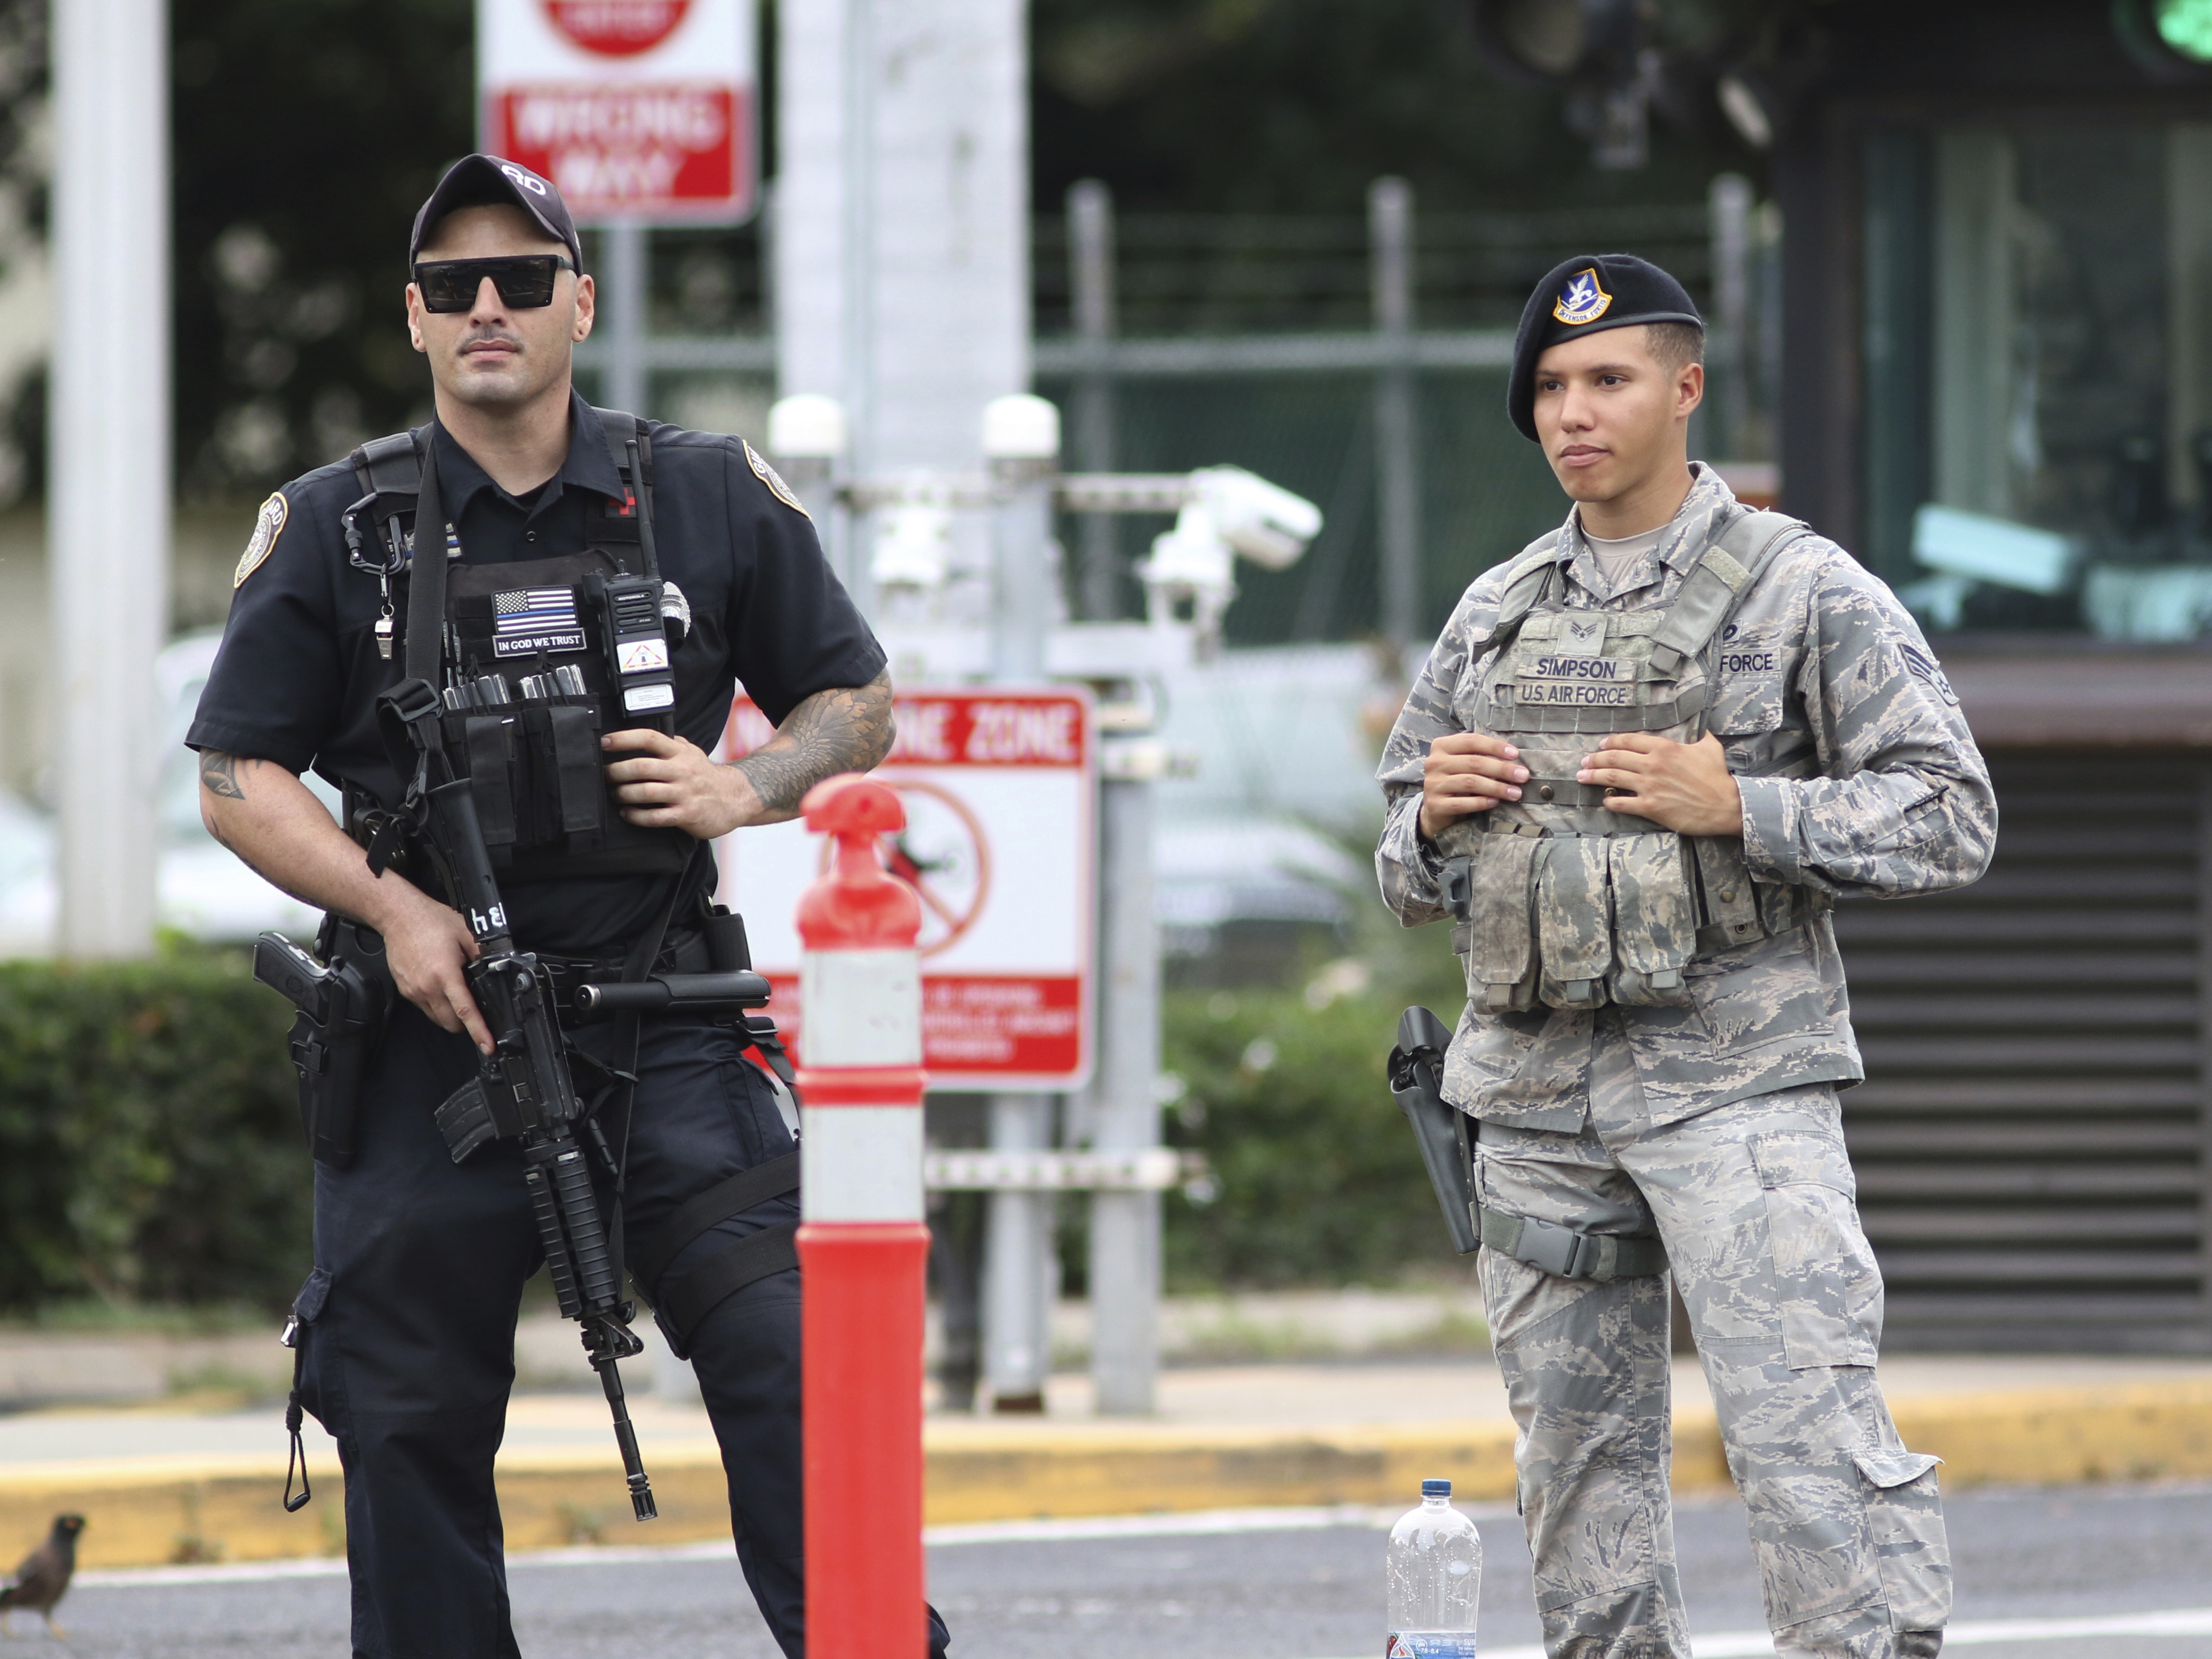 Sailor Kills 2, Wounds 1 Before Taking Own Life At Hawaii's Pearl Harbor Base